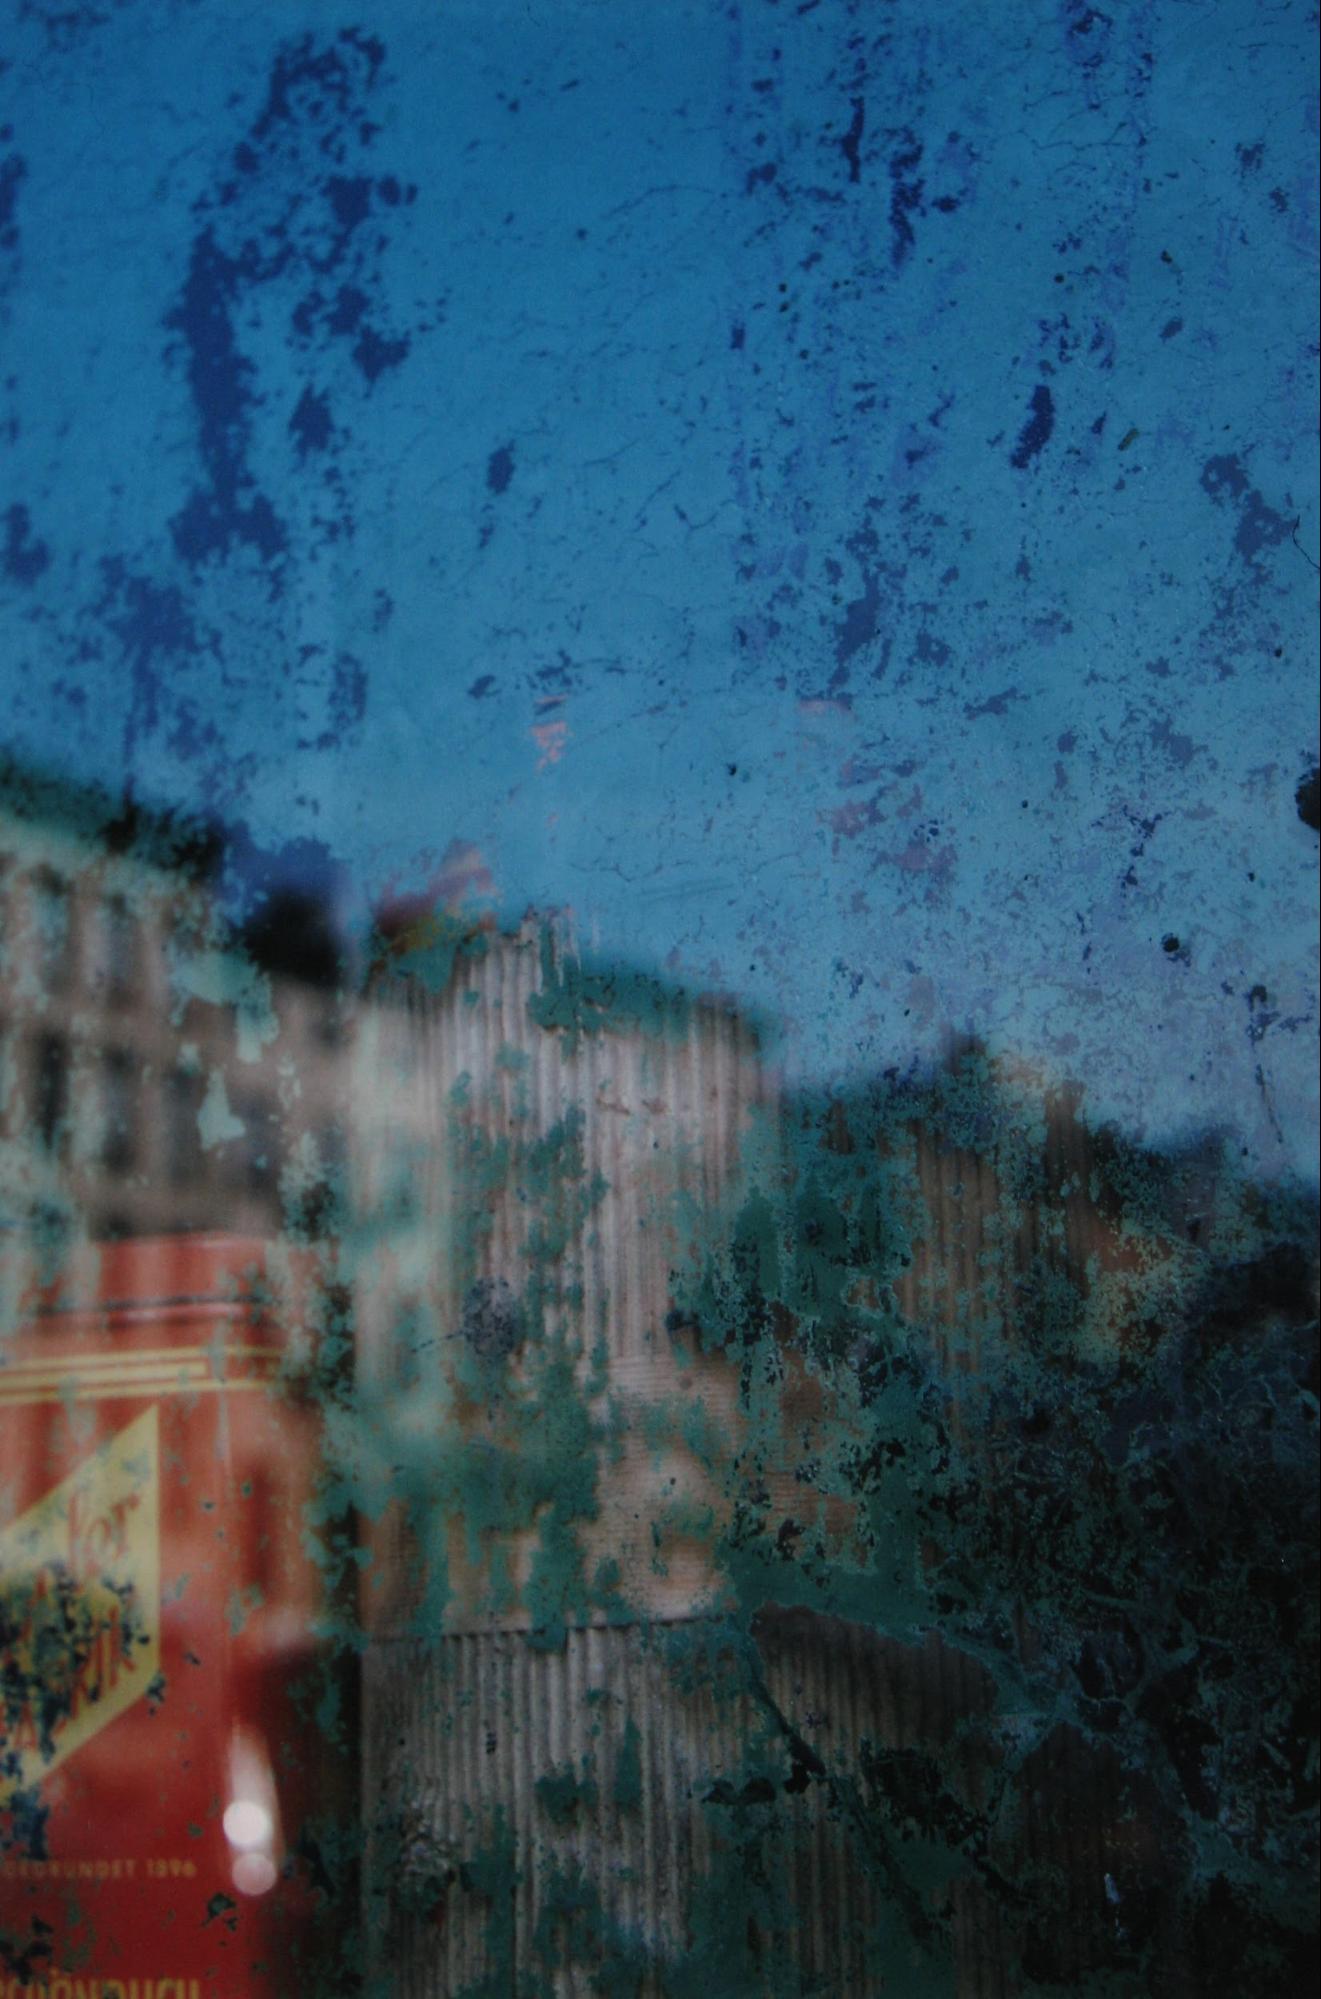 Fenster - New York, 1957 © Saul Leiter Foundation